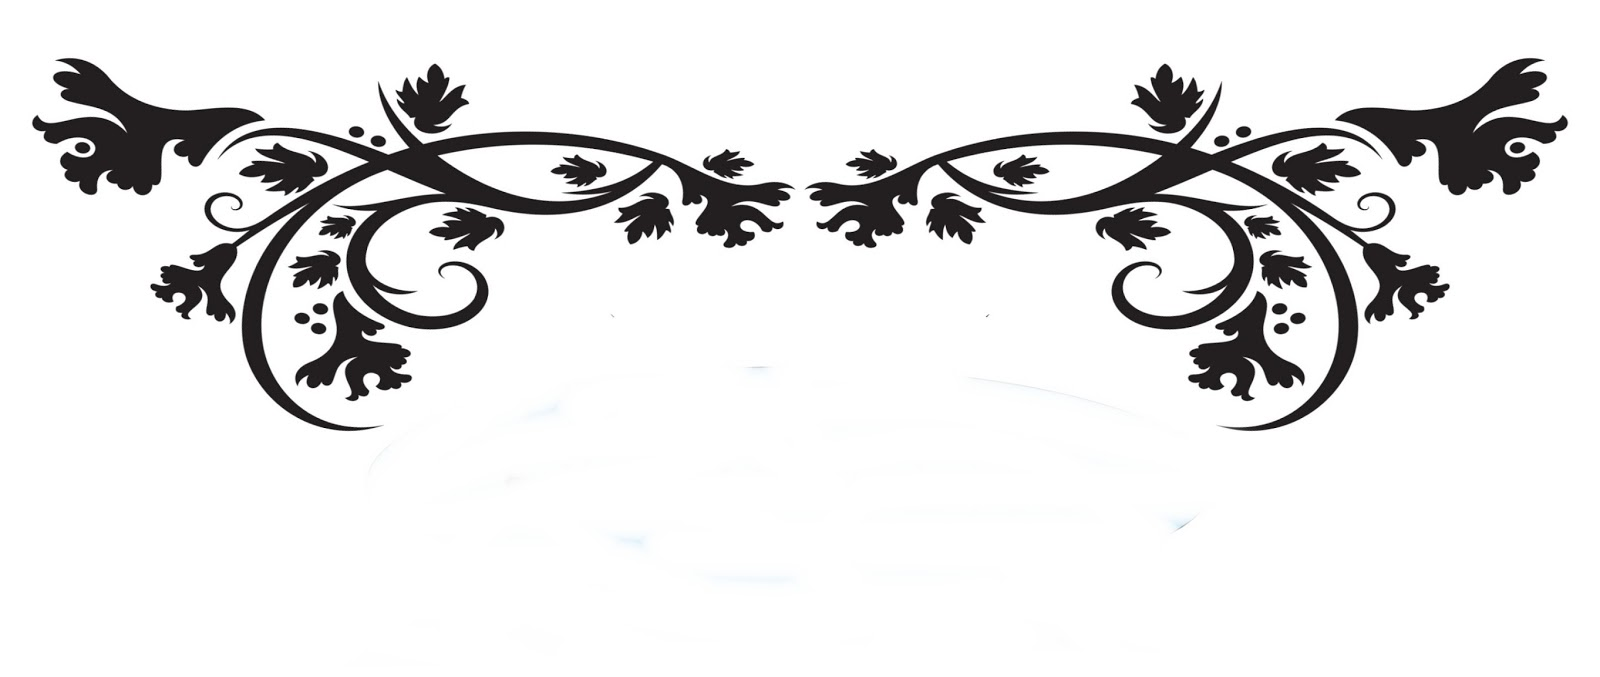 download clip art bunga - photo #32